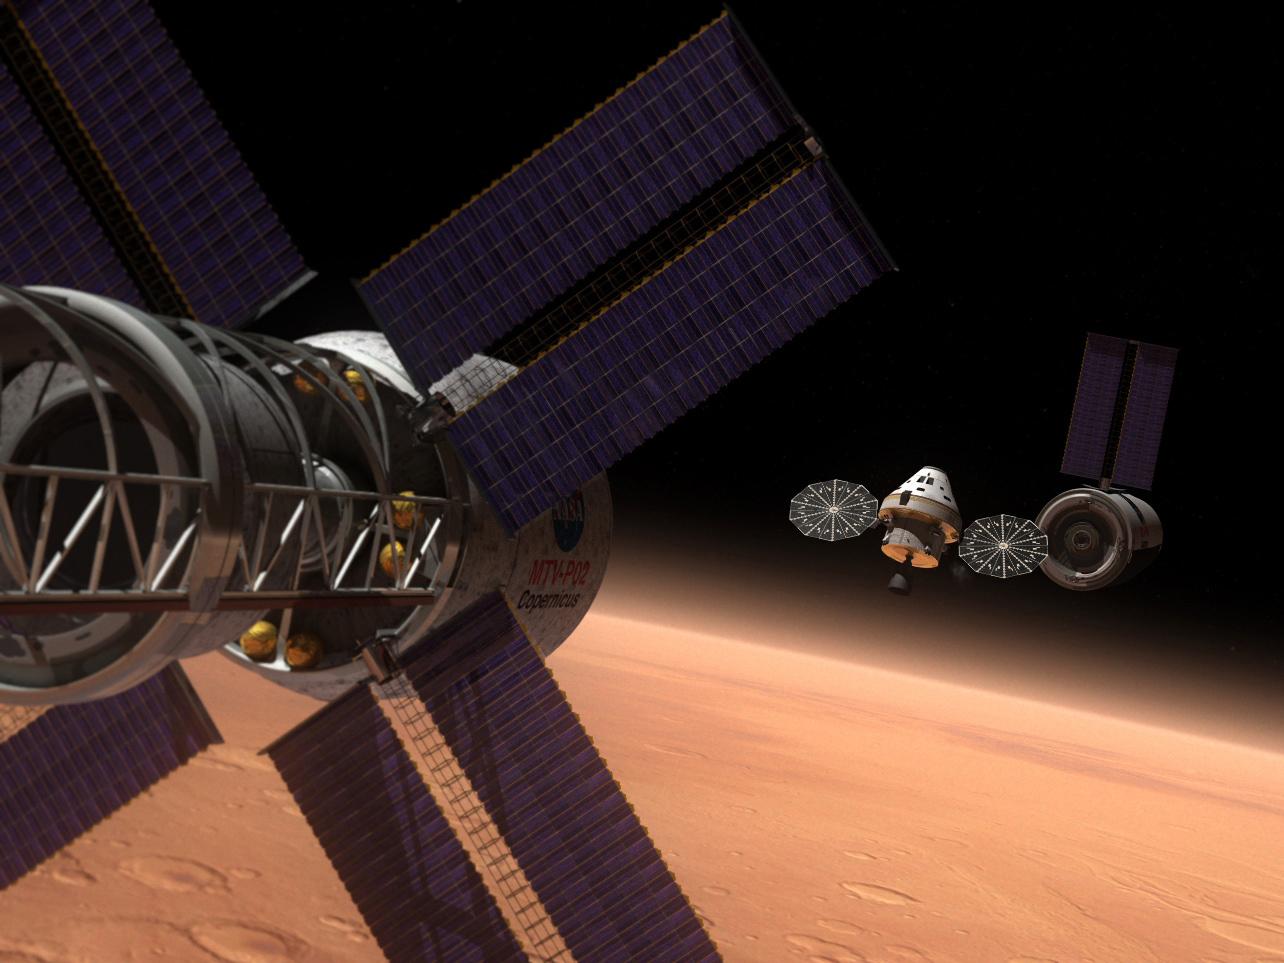 NASA's Multi-Purpose Crew Vehicle Concept